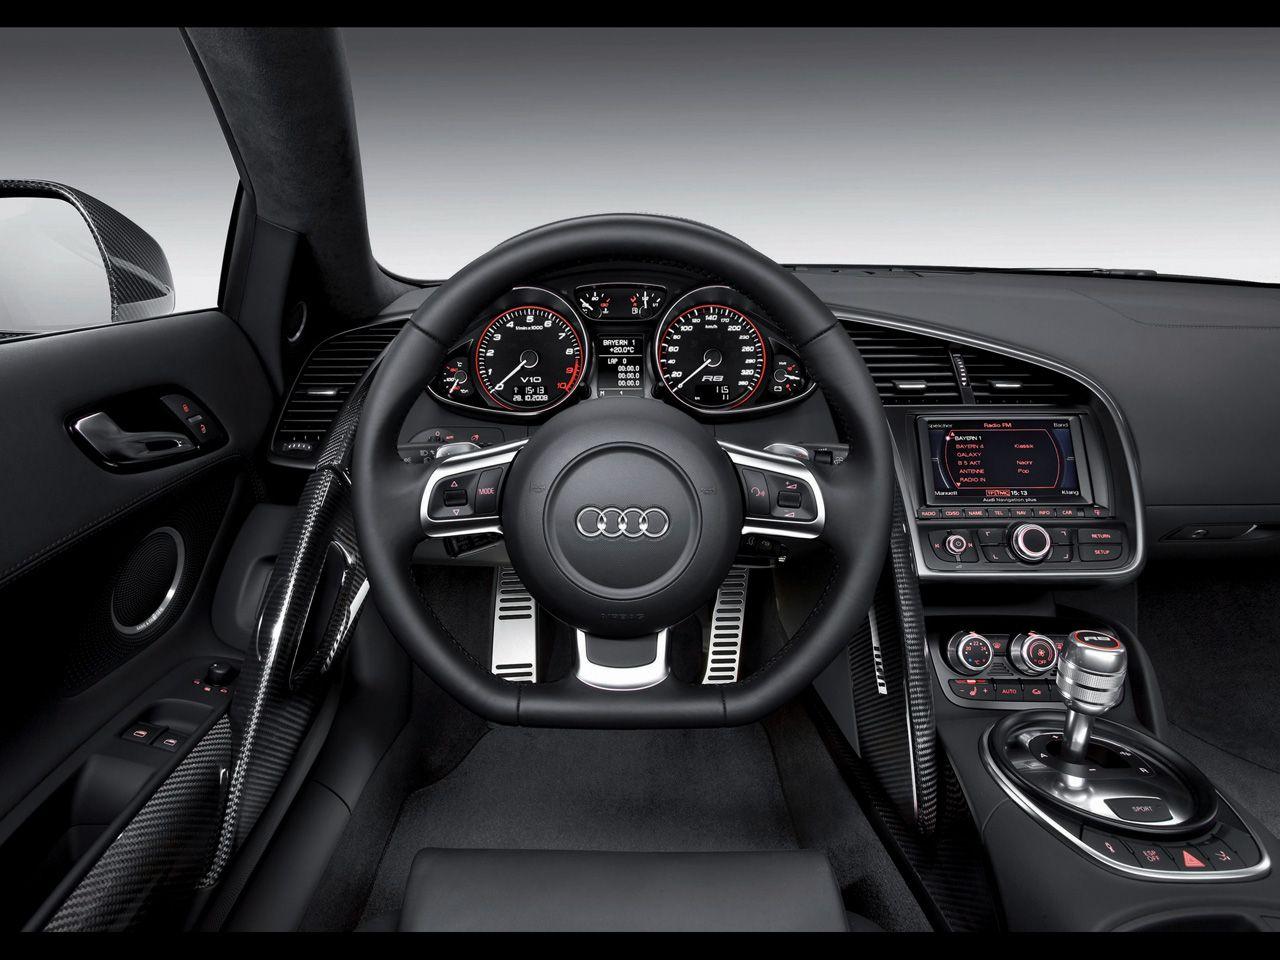 Audi 2011 interior audi resolution 1280 x 904 214 kb jpeg size 1280 x 904 214 kb jpeg not available audi 2011 view on wordpress